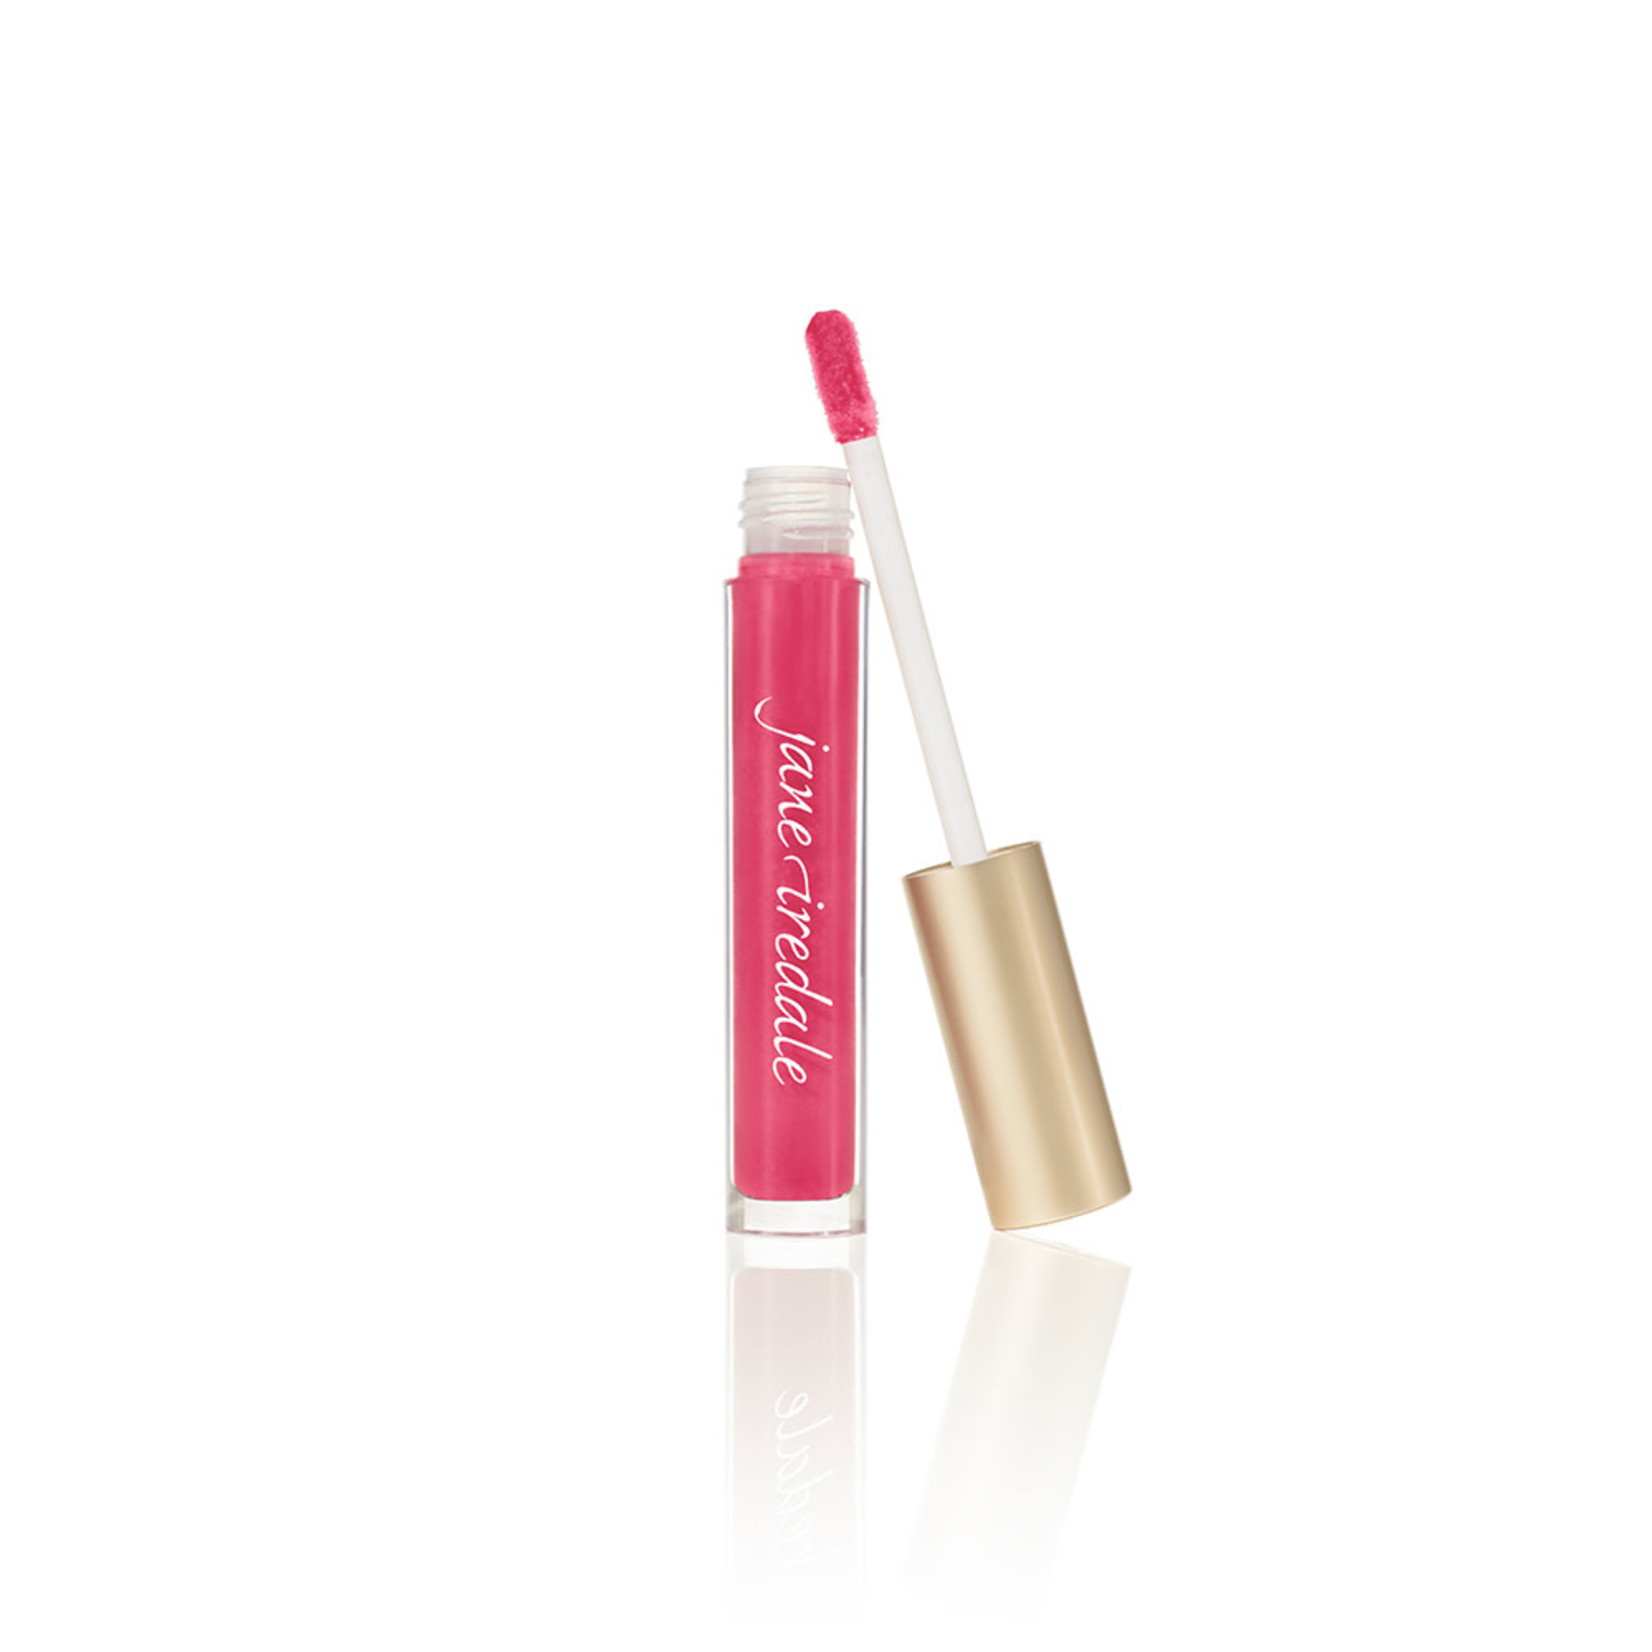 jane iredale Hyaluronic lip gloss - blossom